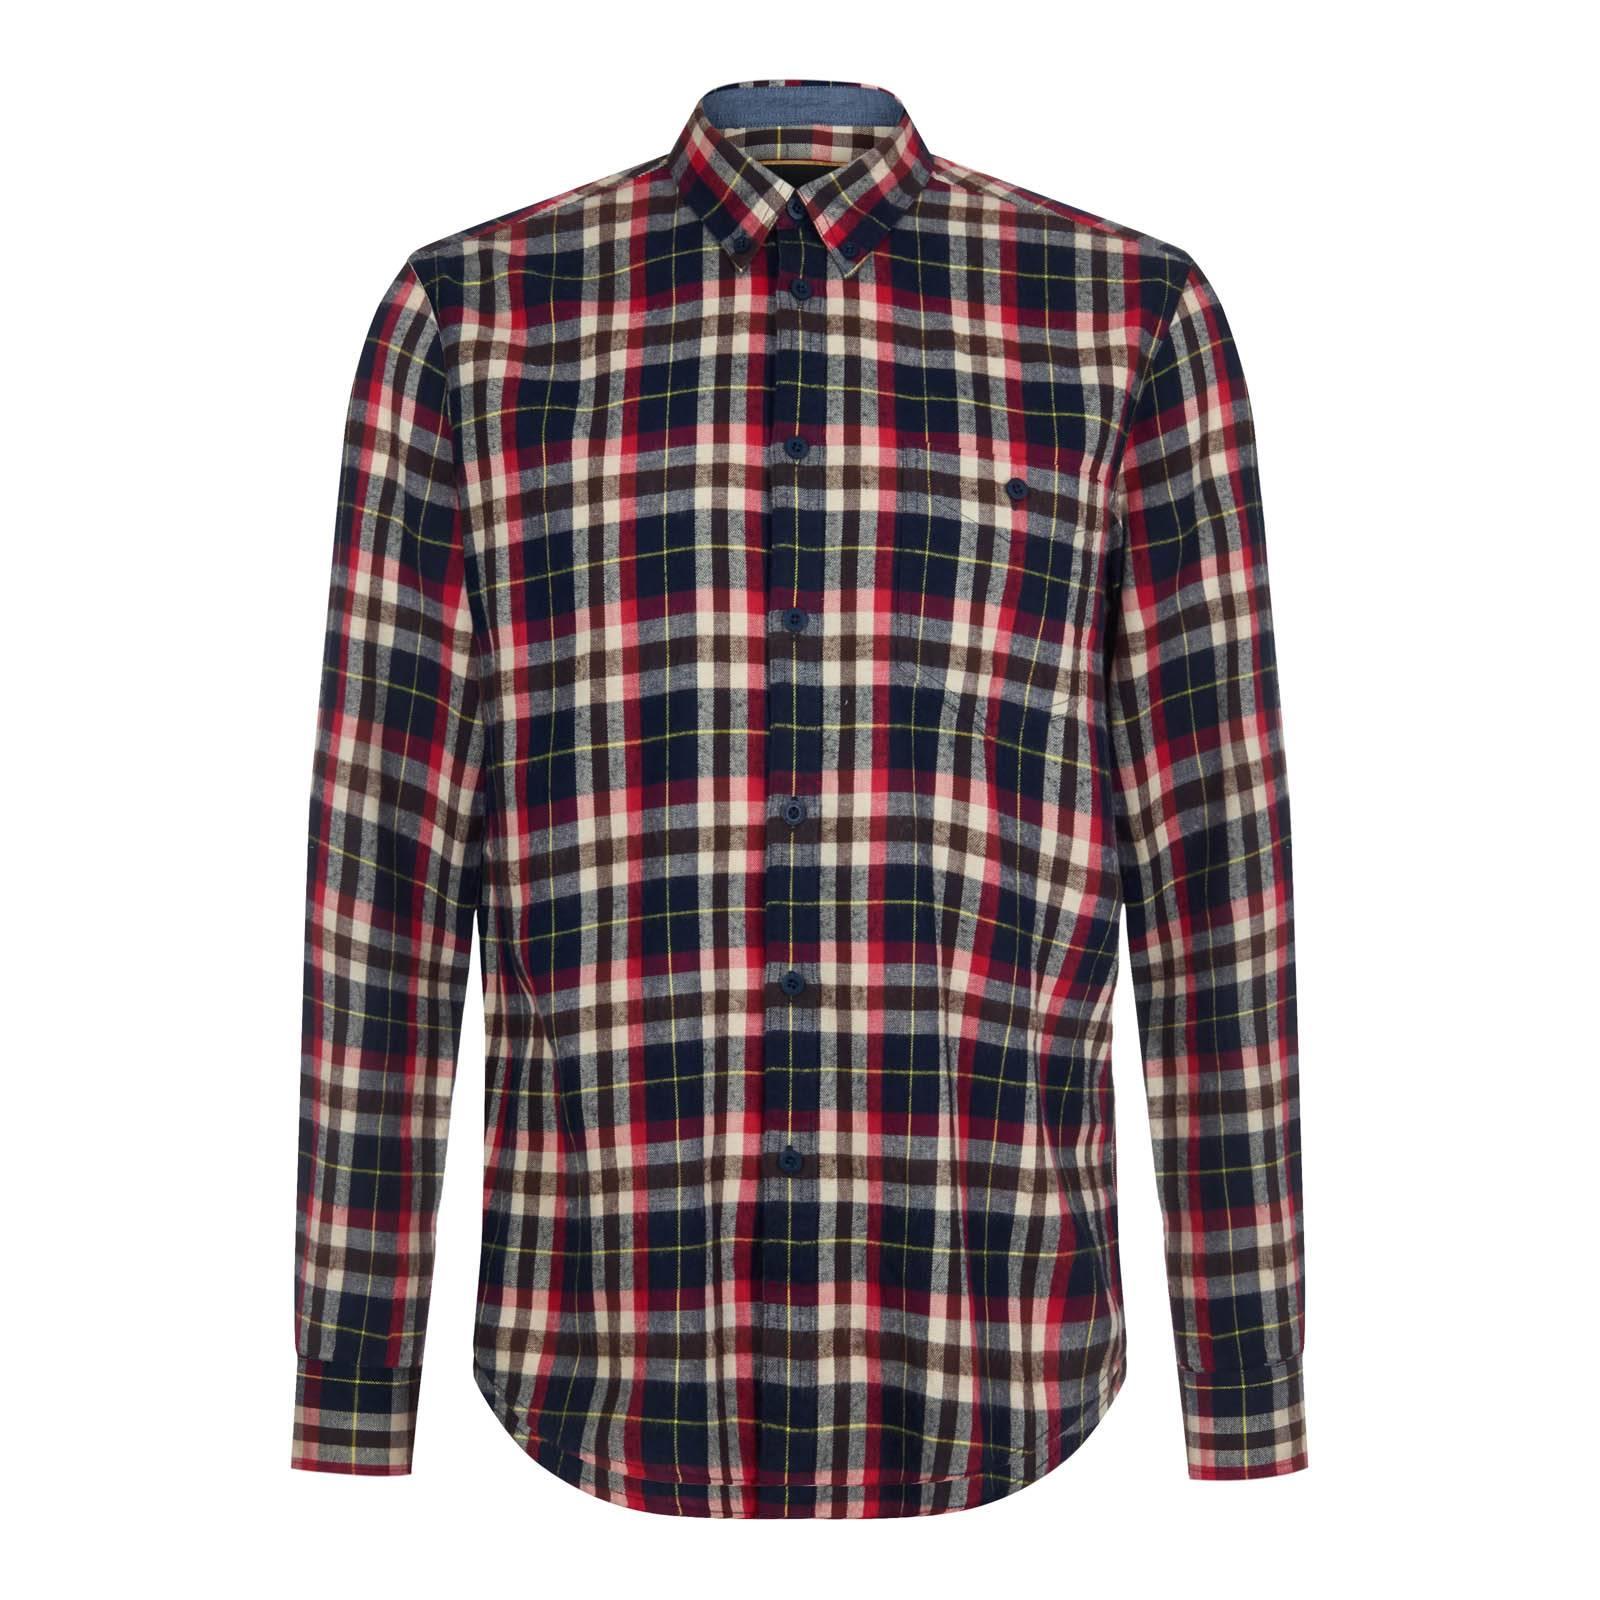 Рубашка TurnerРубашки под заказ<br><br><br>Артикул: 1516214<br>Материал: 100% хлопок<br>Цвет: мультицветный тартан<br>Пол: Мужской